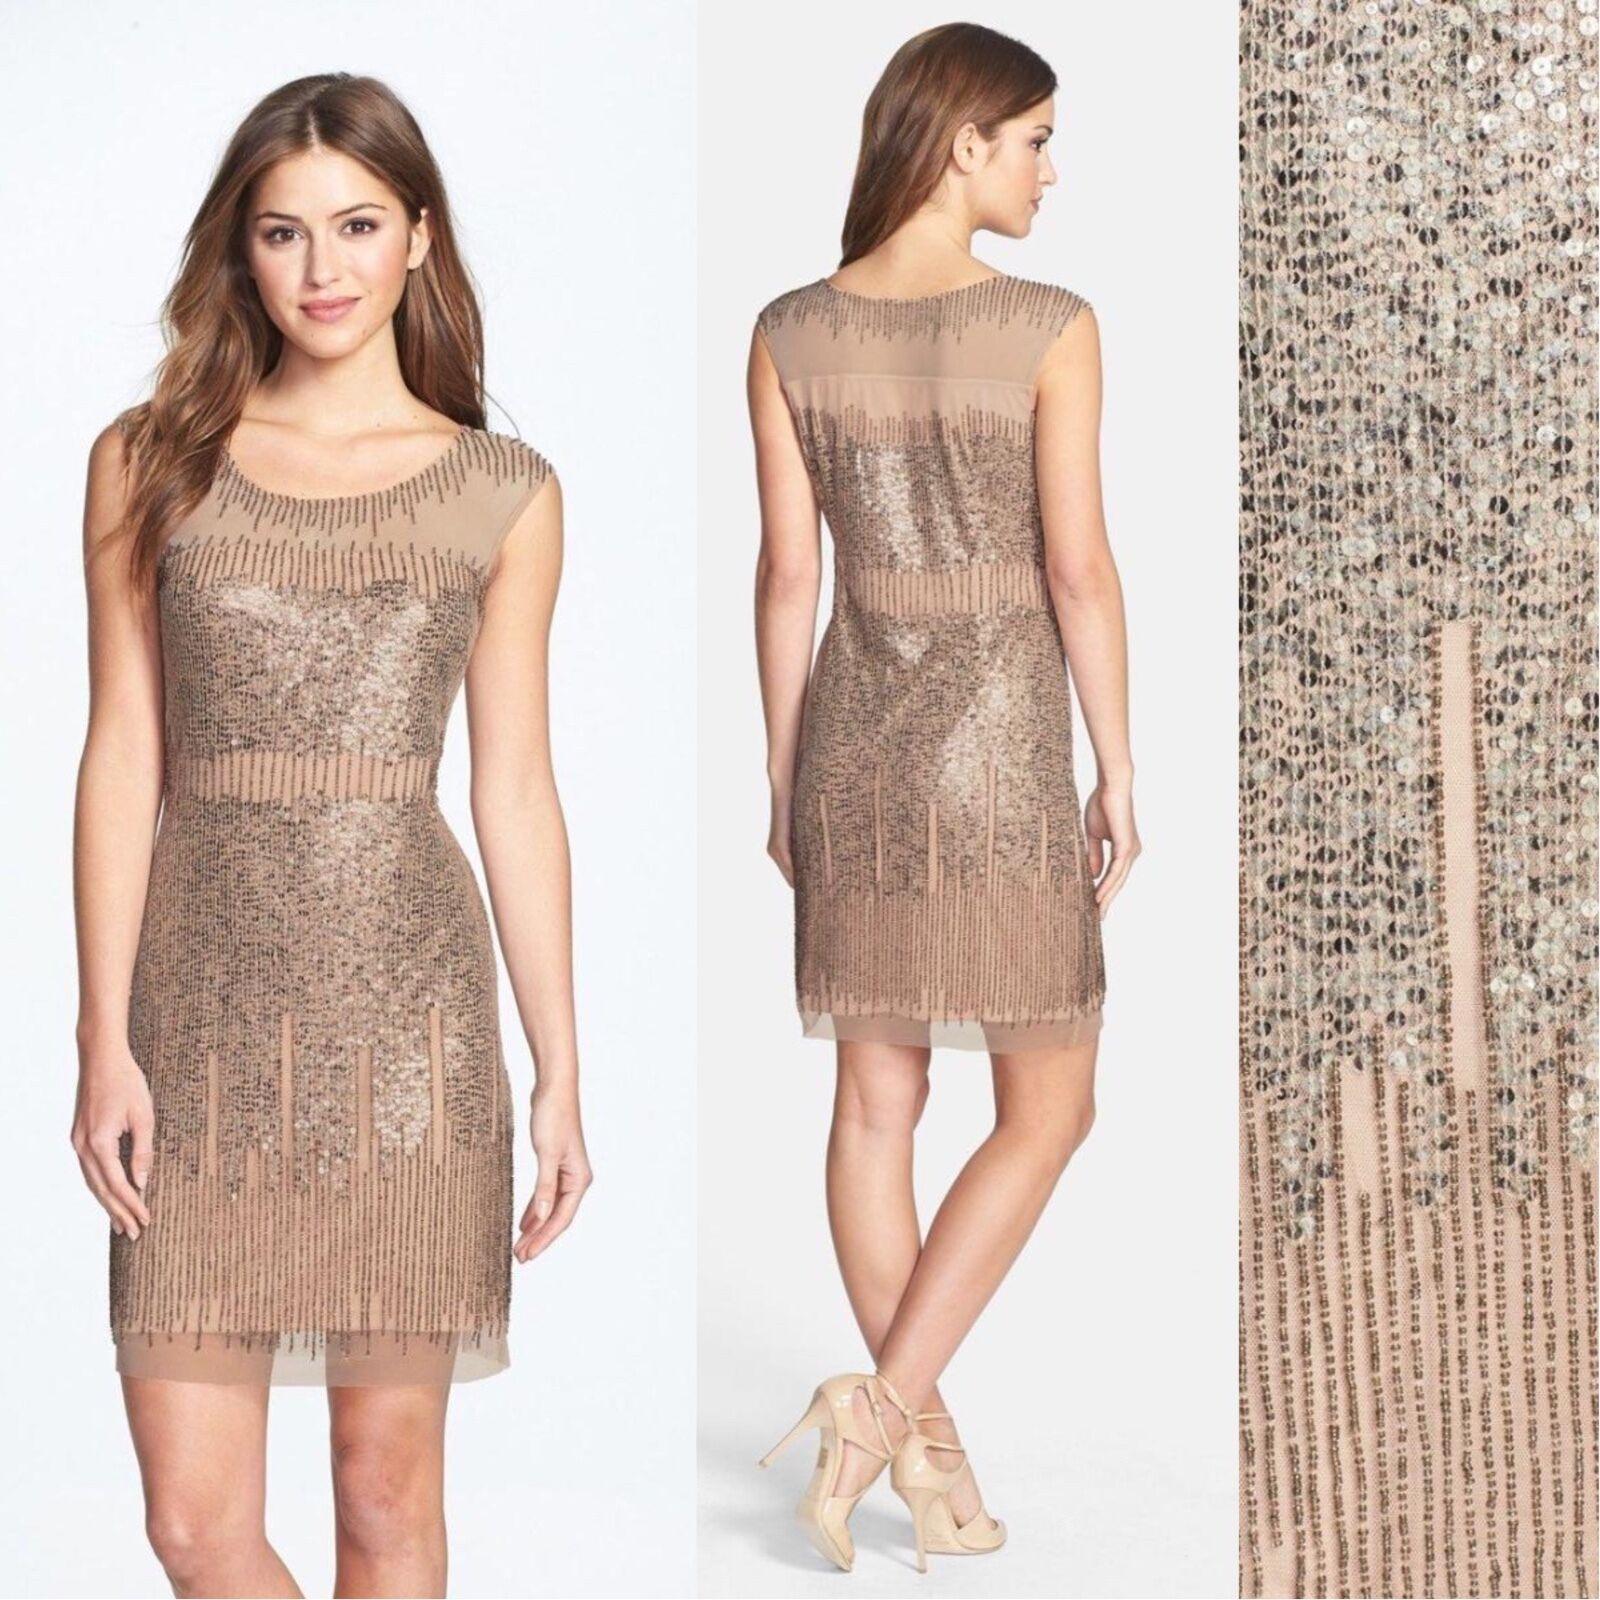 NWT Adrianna Papell Illusion Yoke Beaded Sheath Dress Taupe [ 6 8 14 ]  AP31